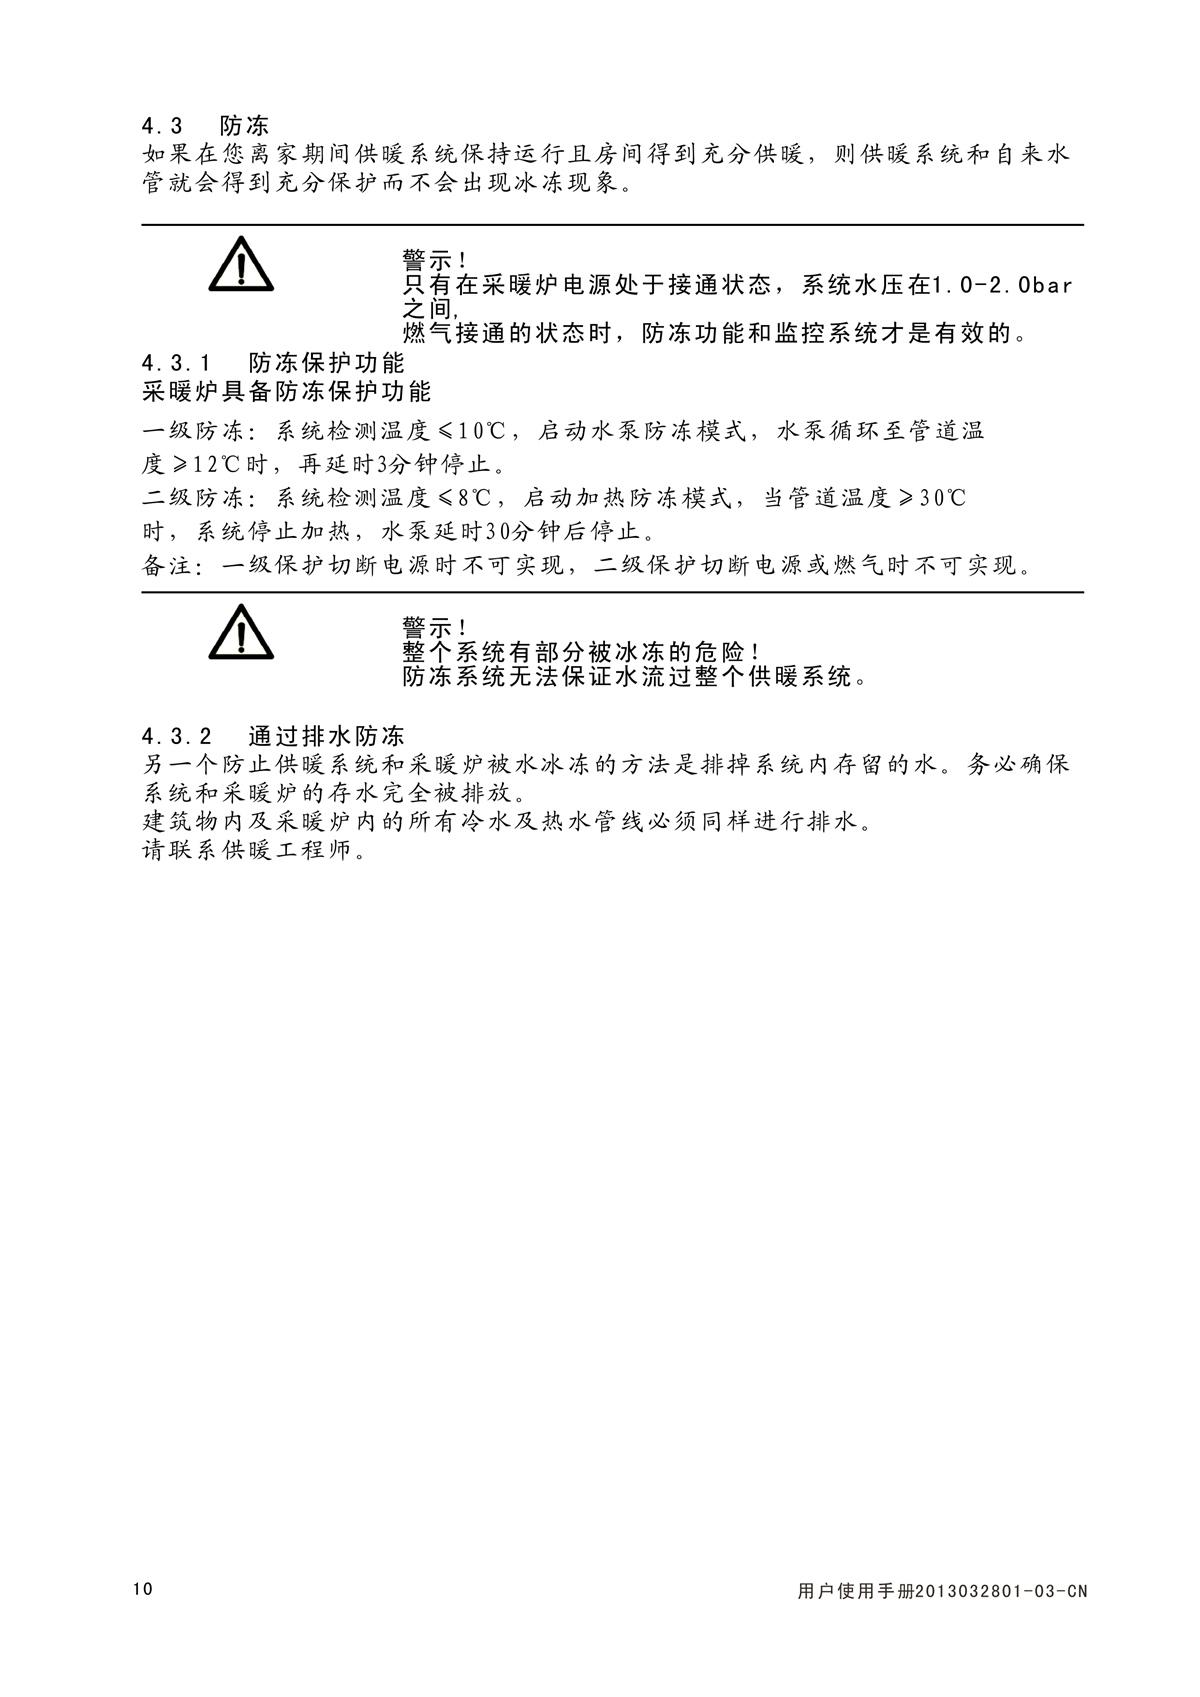 ES16B系列-用户使用手册-8_01.jpg